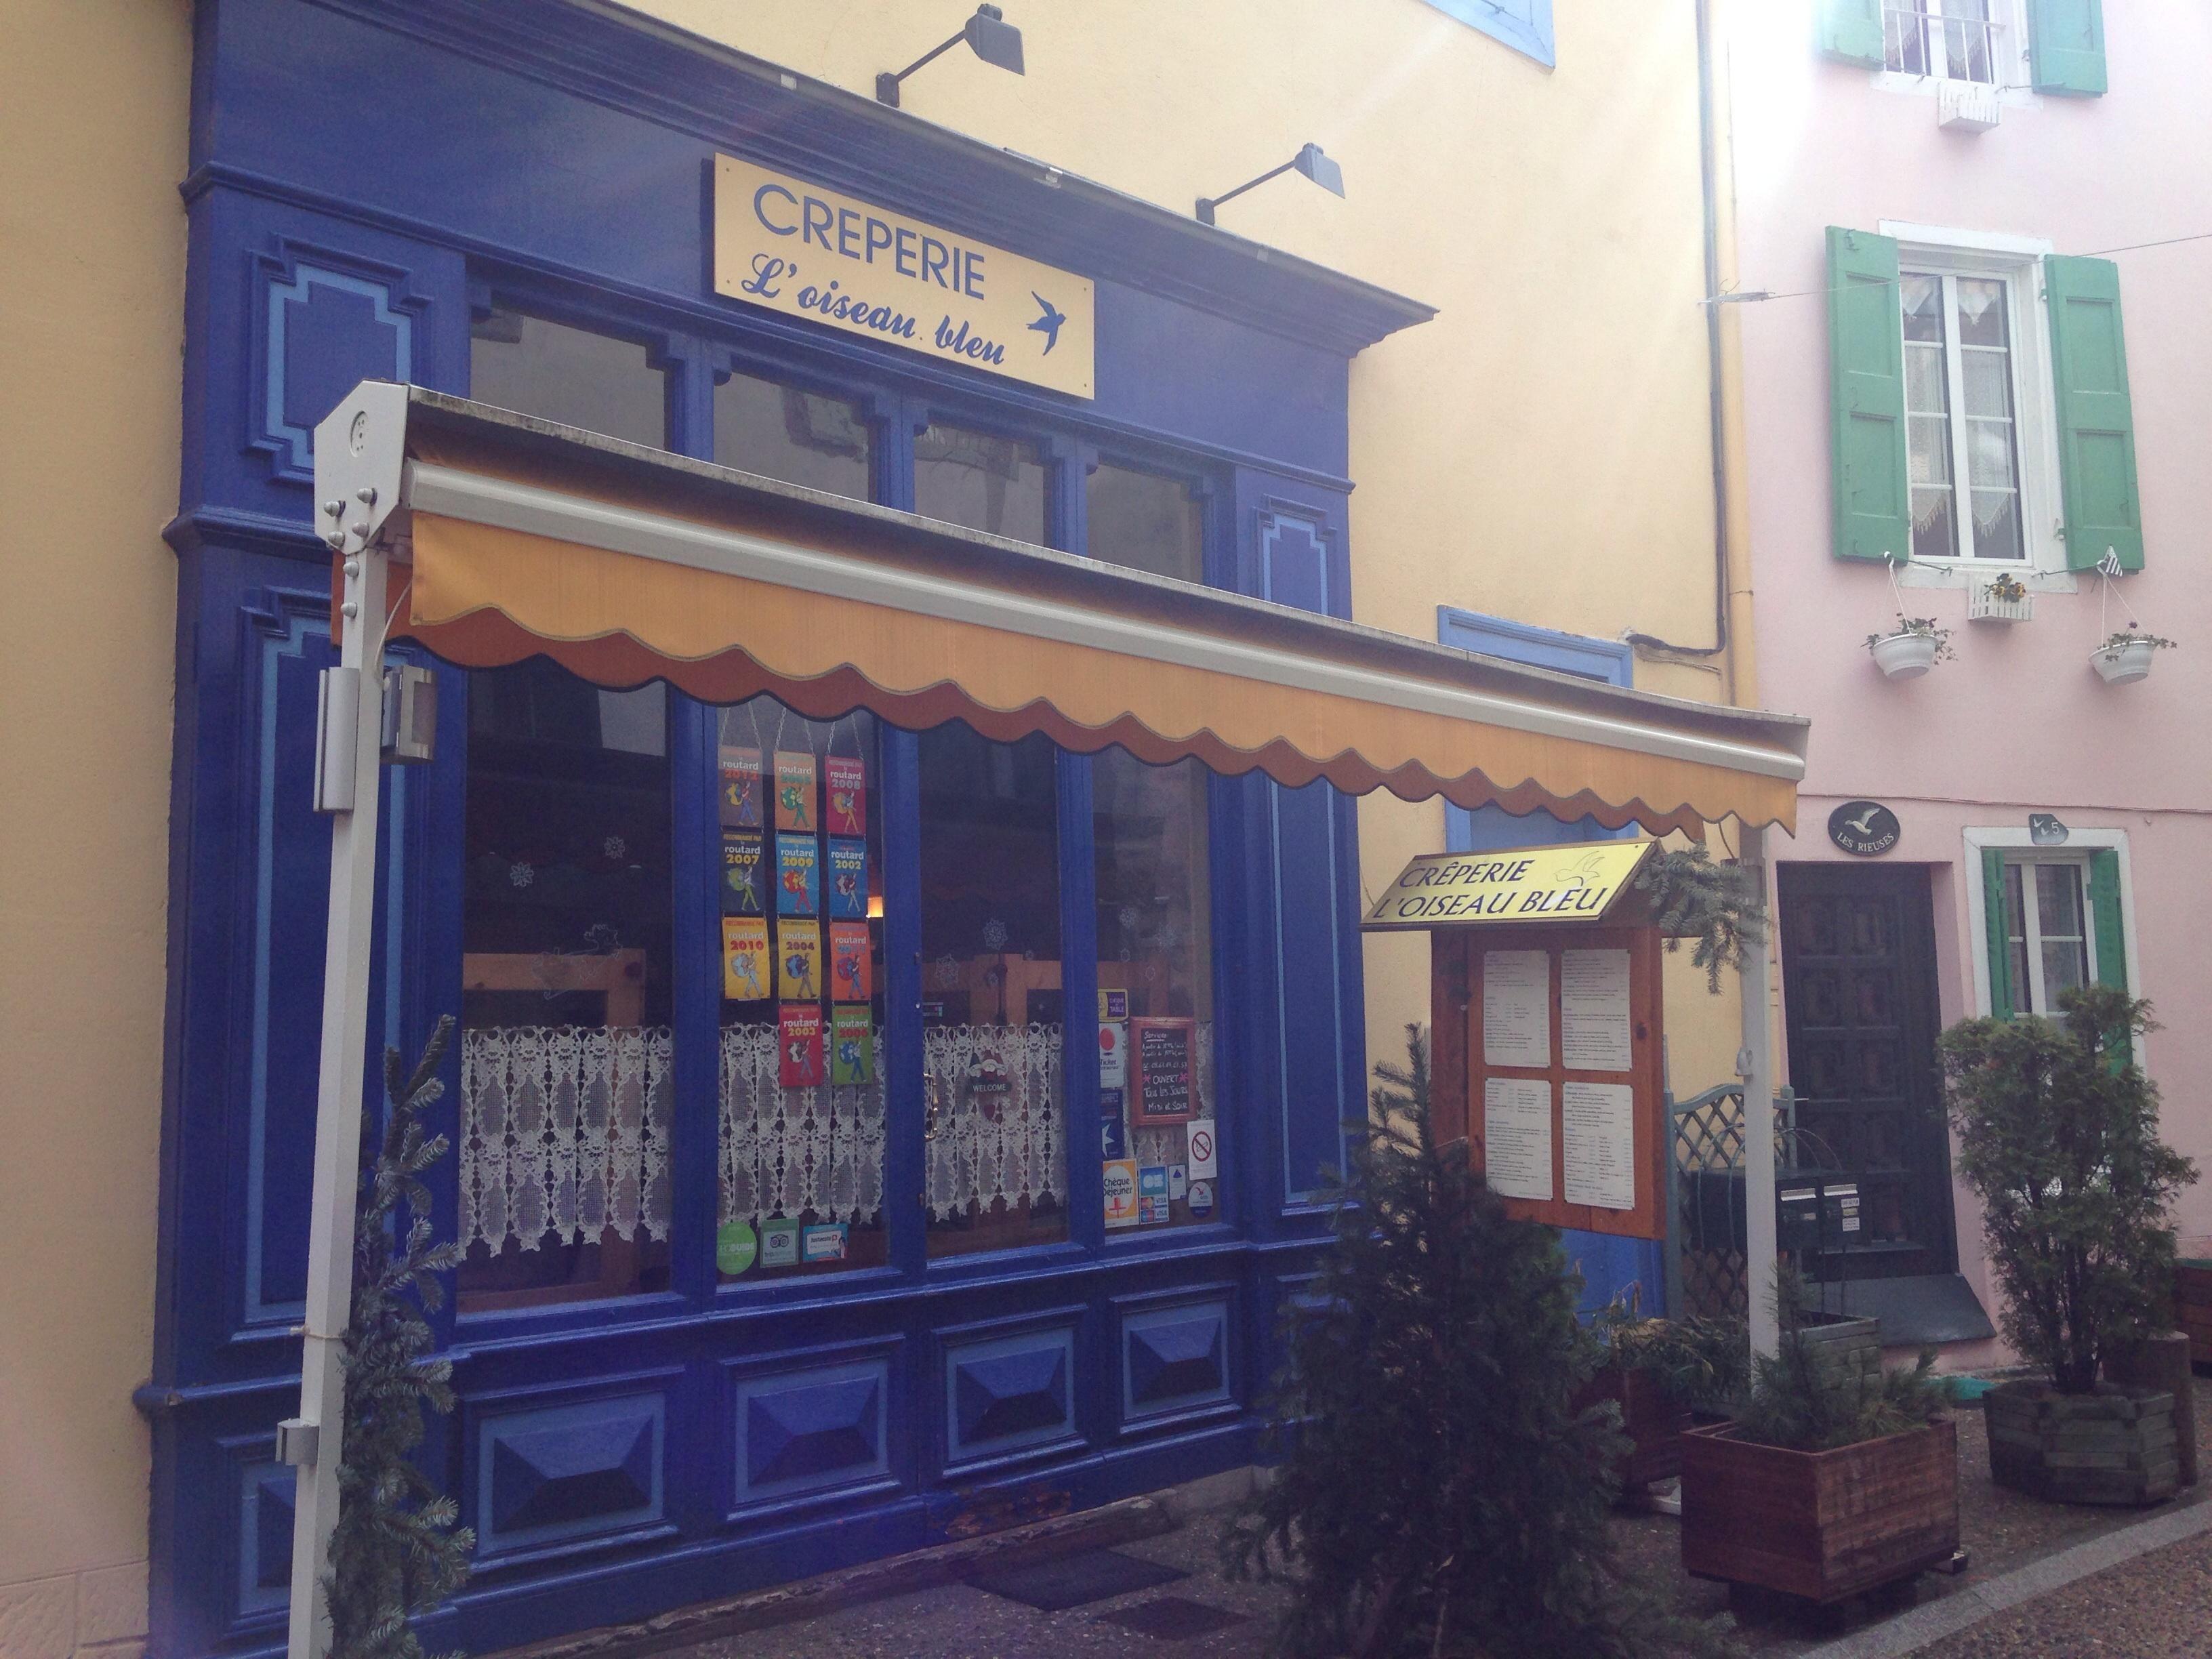 Restaurant crêperie L\'oiseau Bleu, Ax-les-Thermes - #ValléesAx ...